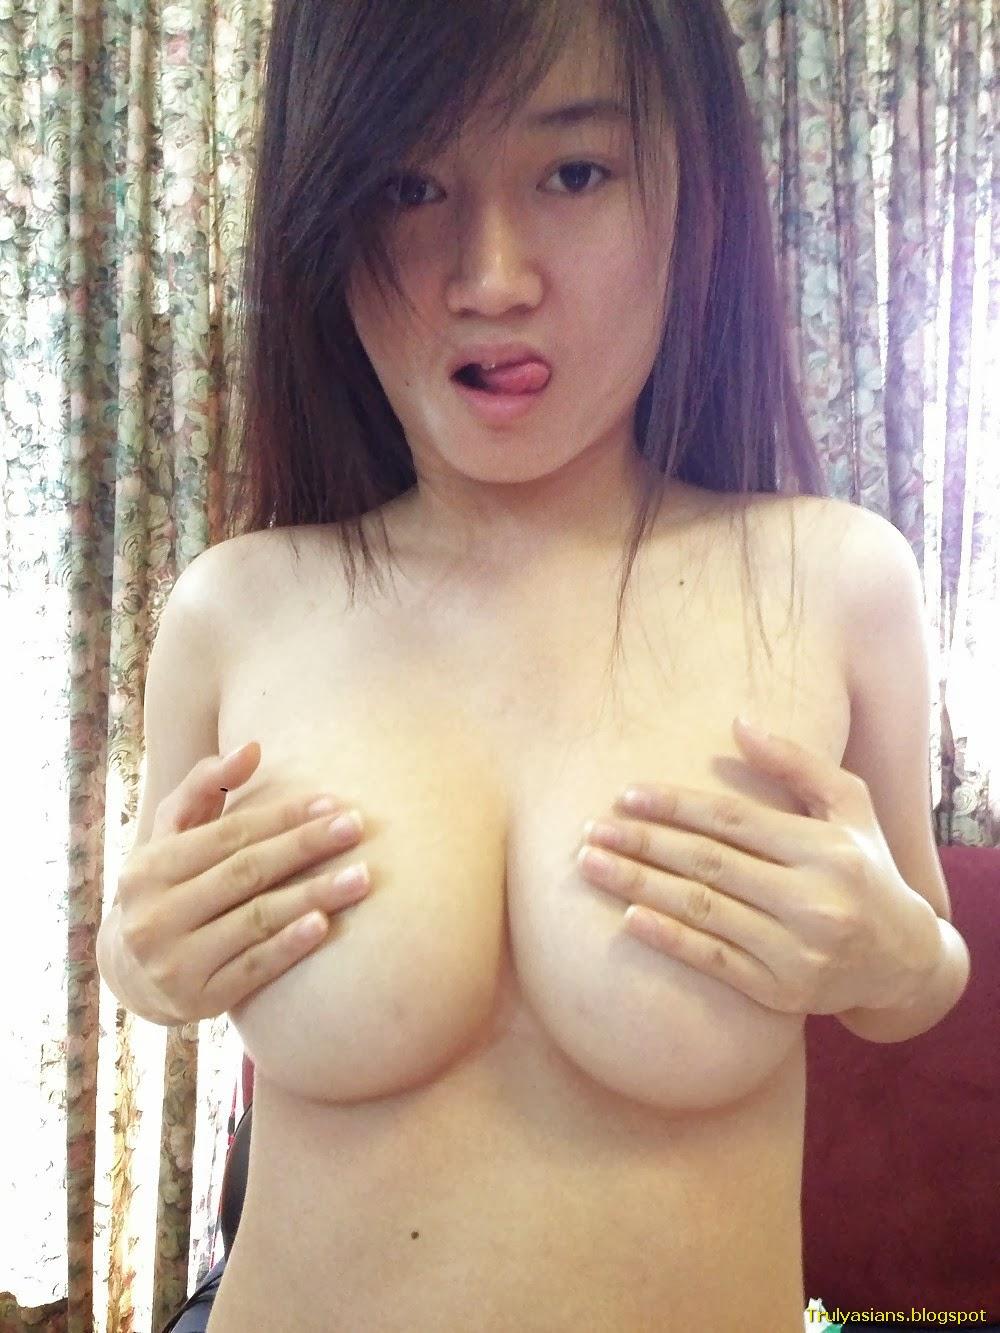 http://2.bp.blogspot.com/-GqEgpfd7rhI/UpaAA009koI/AAAAAAAAN1M/XPvftrP-U9s/s1600/trulyasians.blogspot+-+Taiwan+GF+Wild+Sex+in+Singapore+053+.jpg